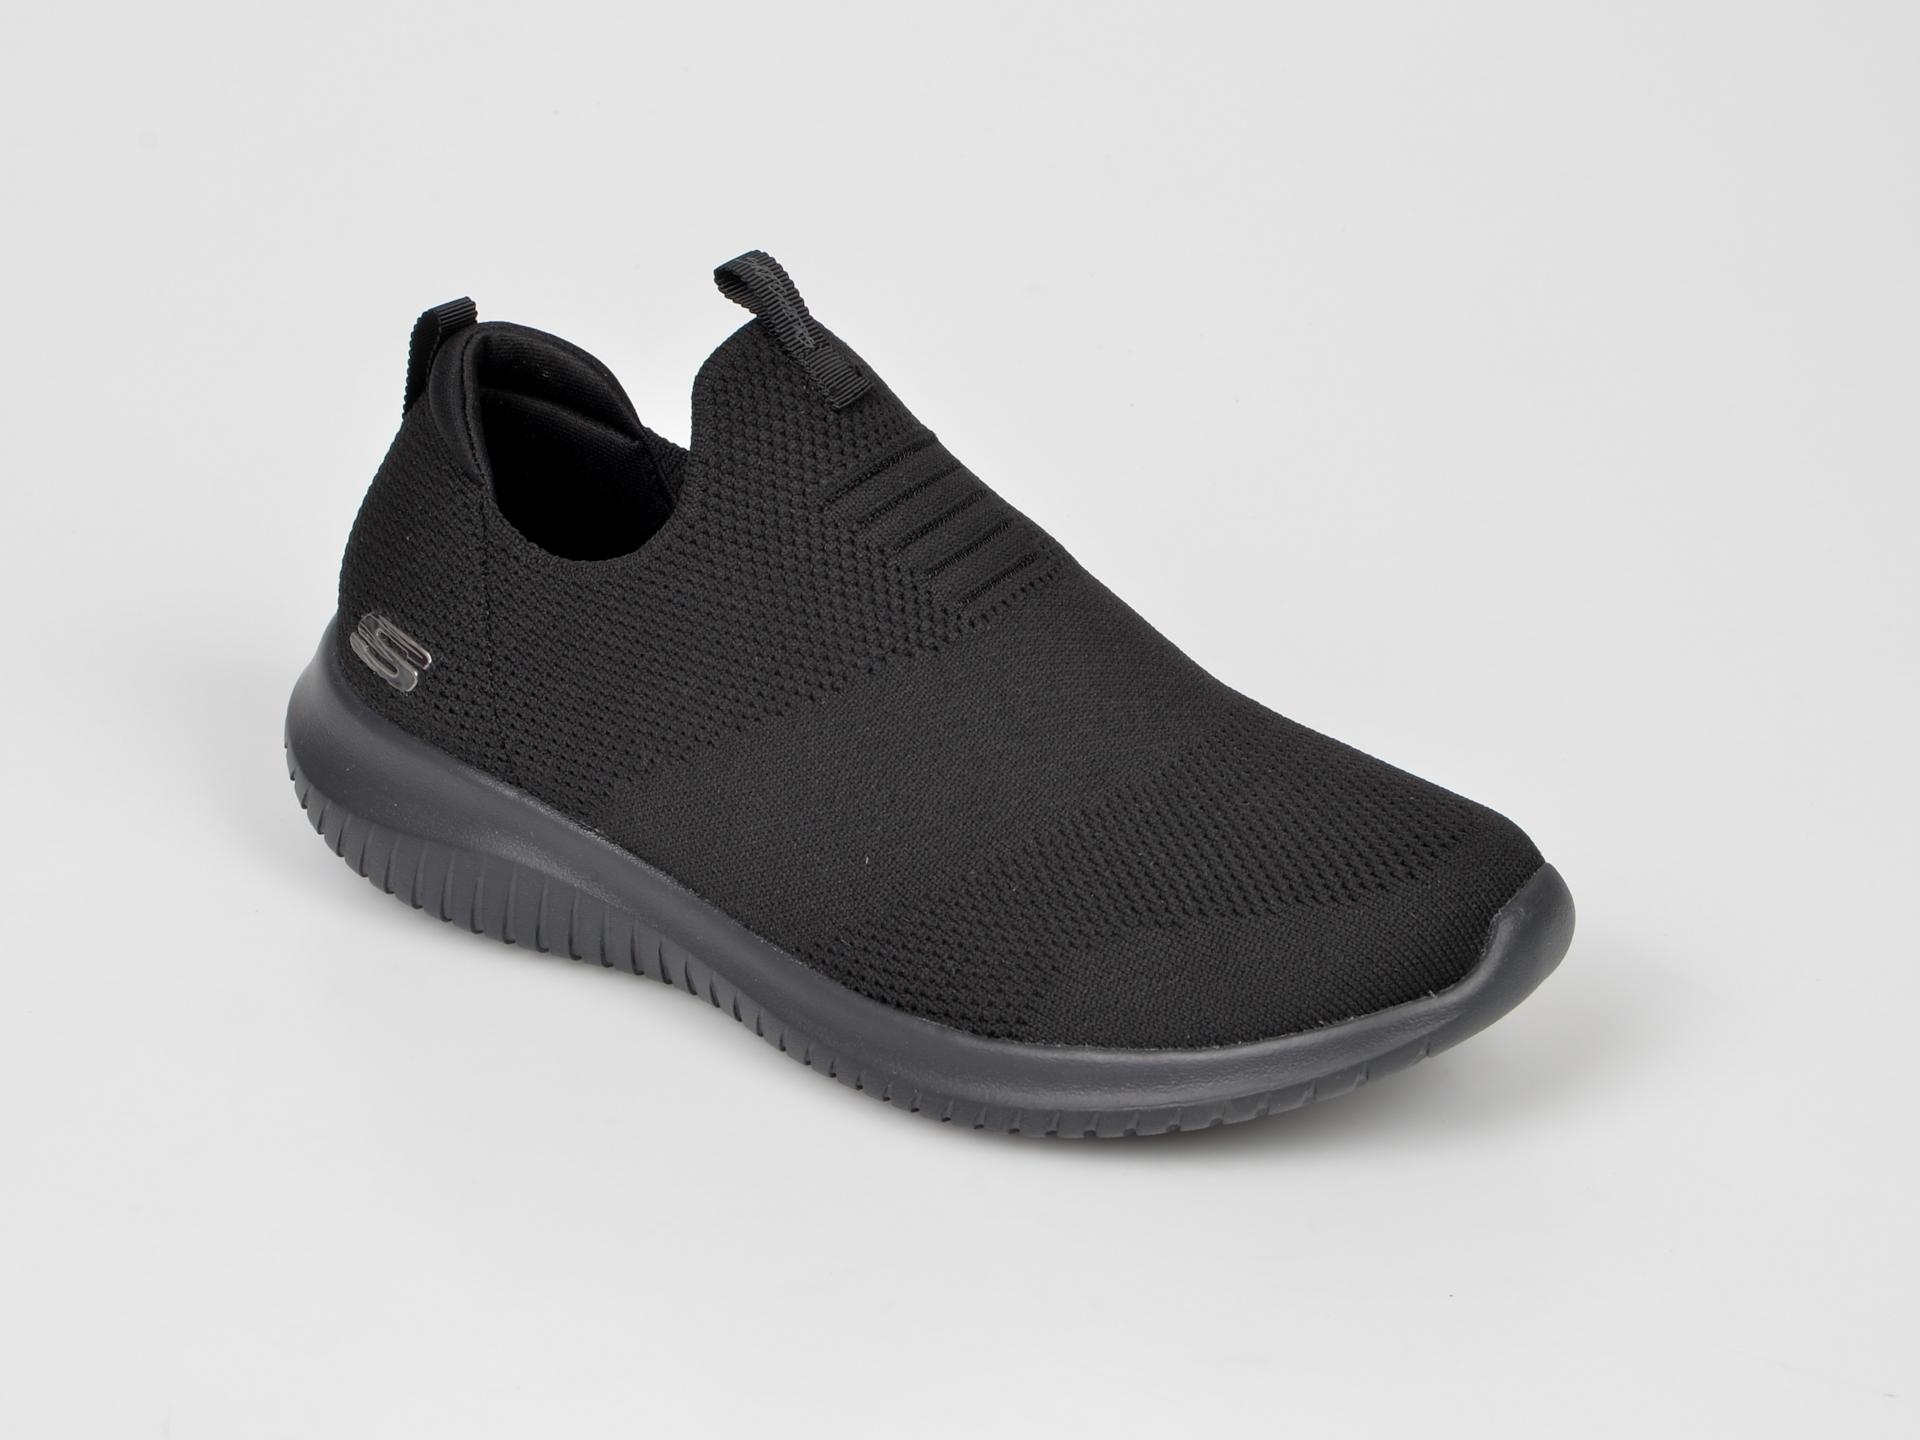 Pantofi Sport Skechers Negri, 12837, Din Piele Ecologica